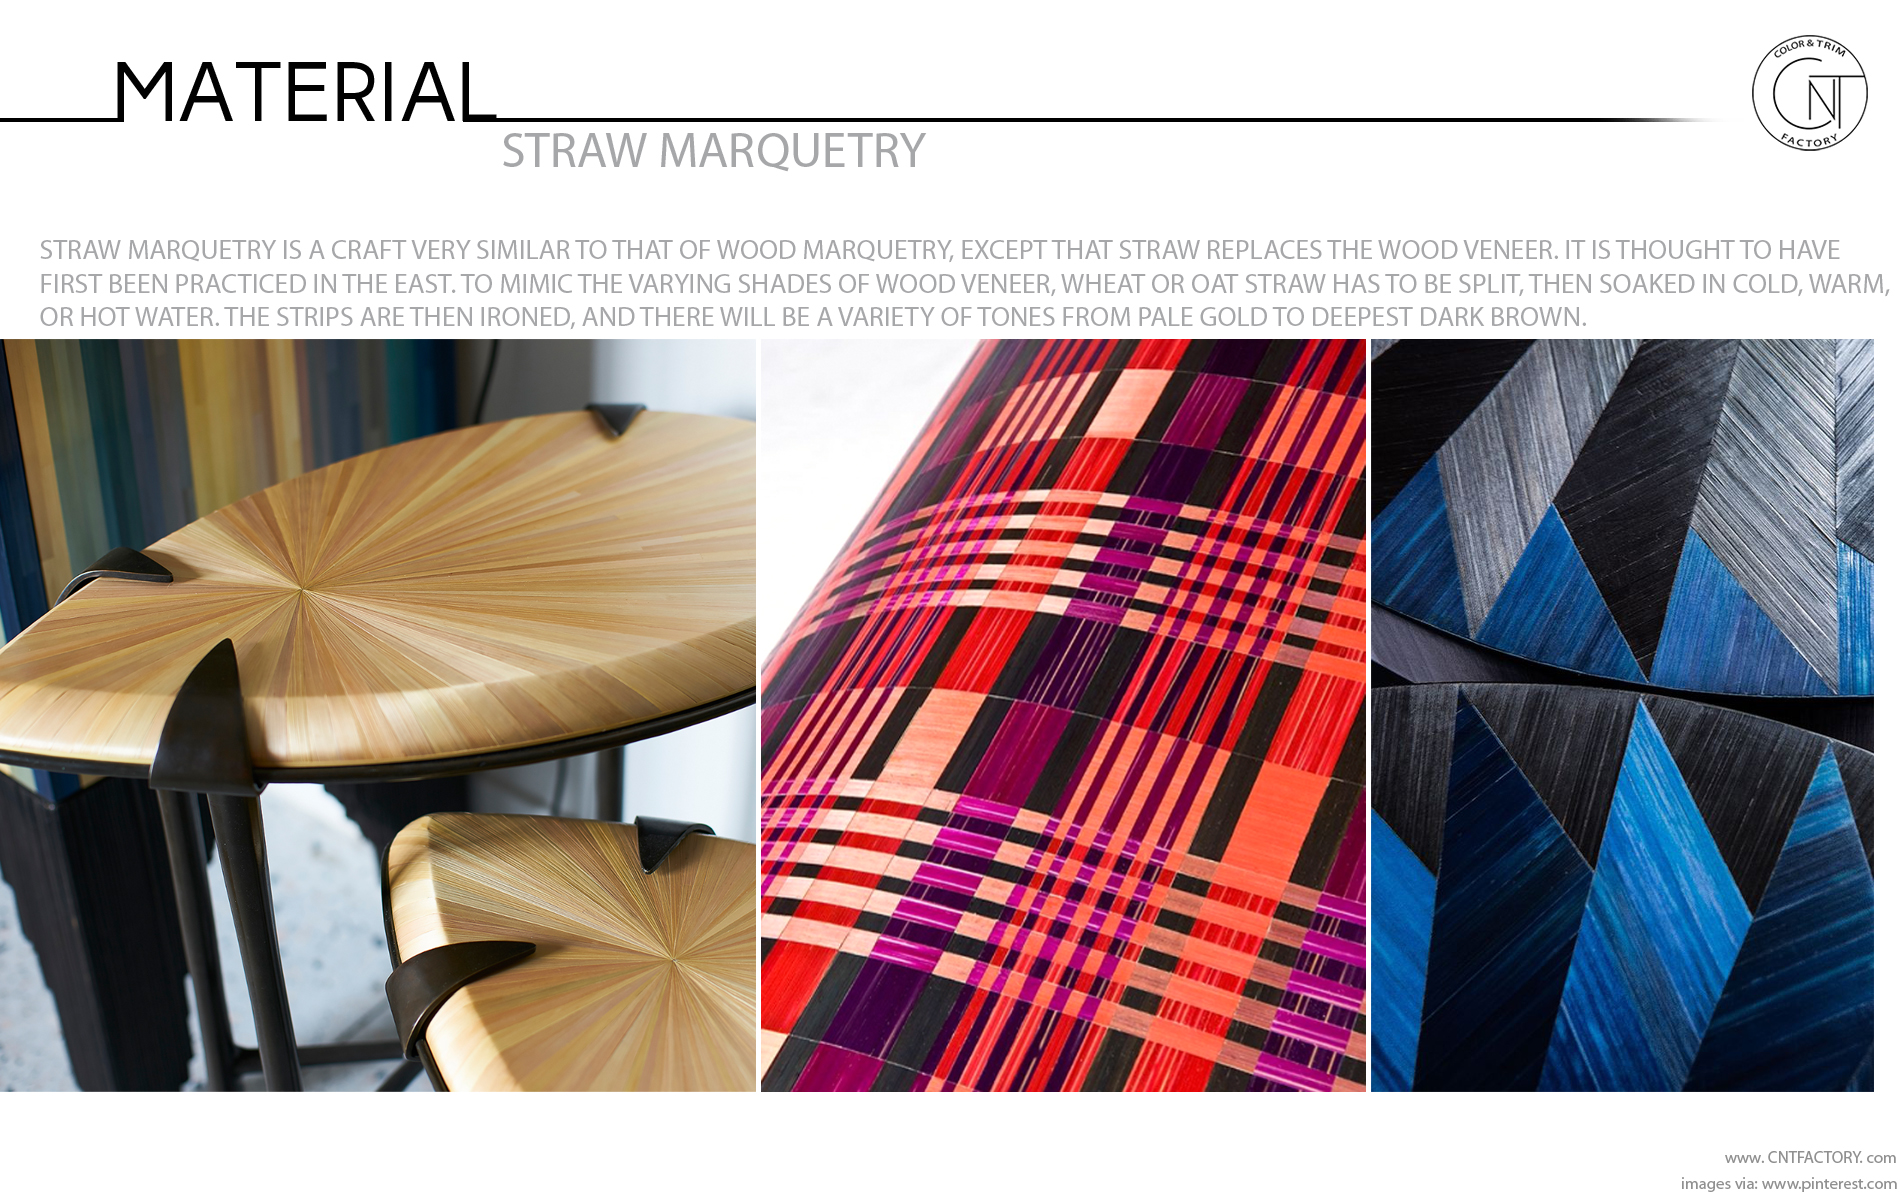 straw marquetry material interior automotive color trim design